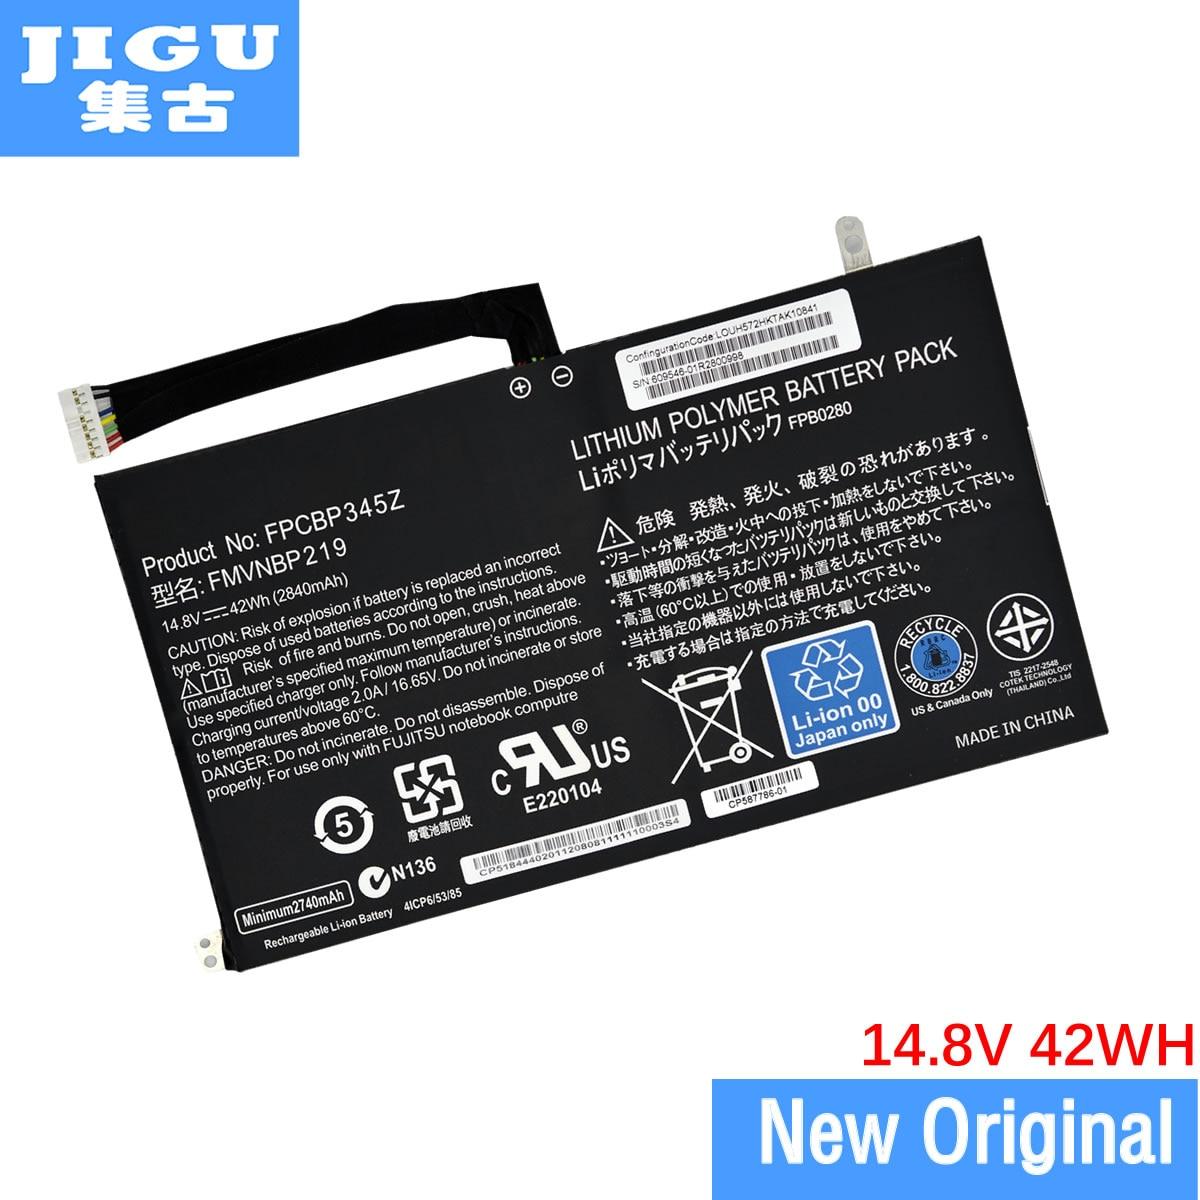 JIGU Original FPCBP345Z Laptop Battery for Fujitsu LifeBook UH572 UH552 Ultrabook FMVNBP219 FPB0280 FPCBP345Z 14.8V 2840mAh samsung rs 552 nruasl